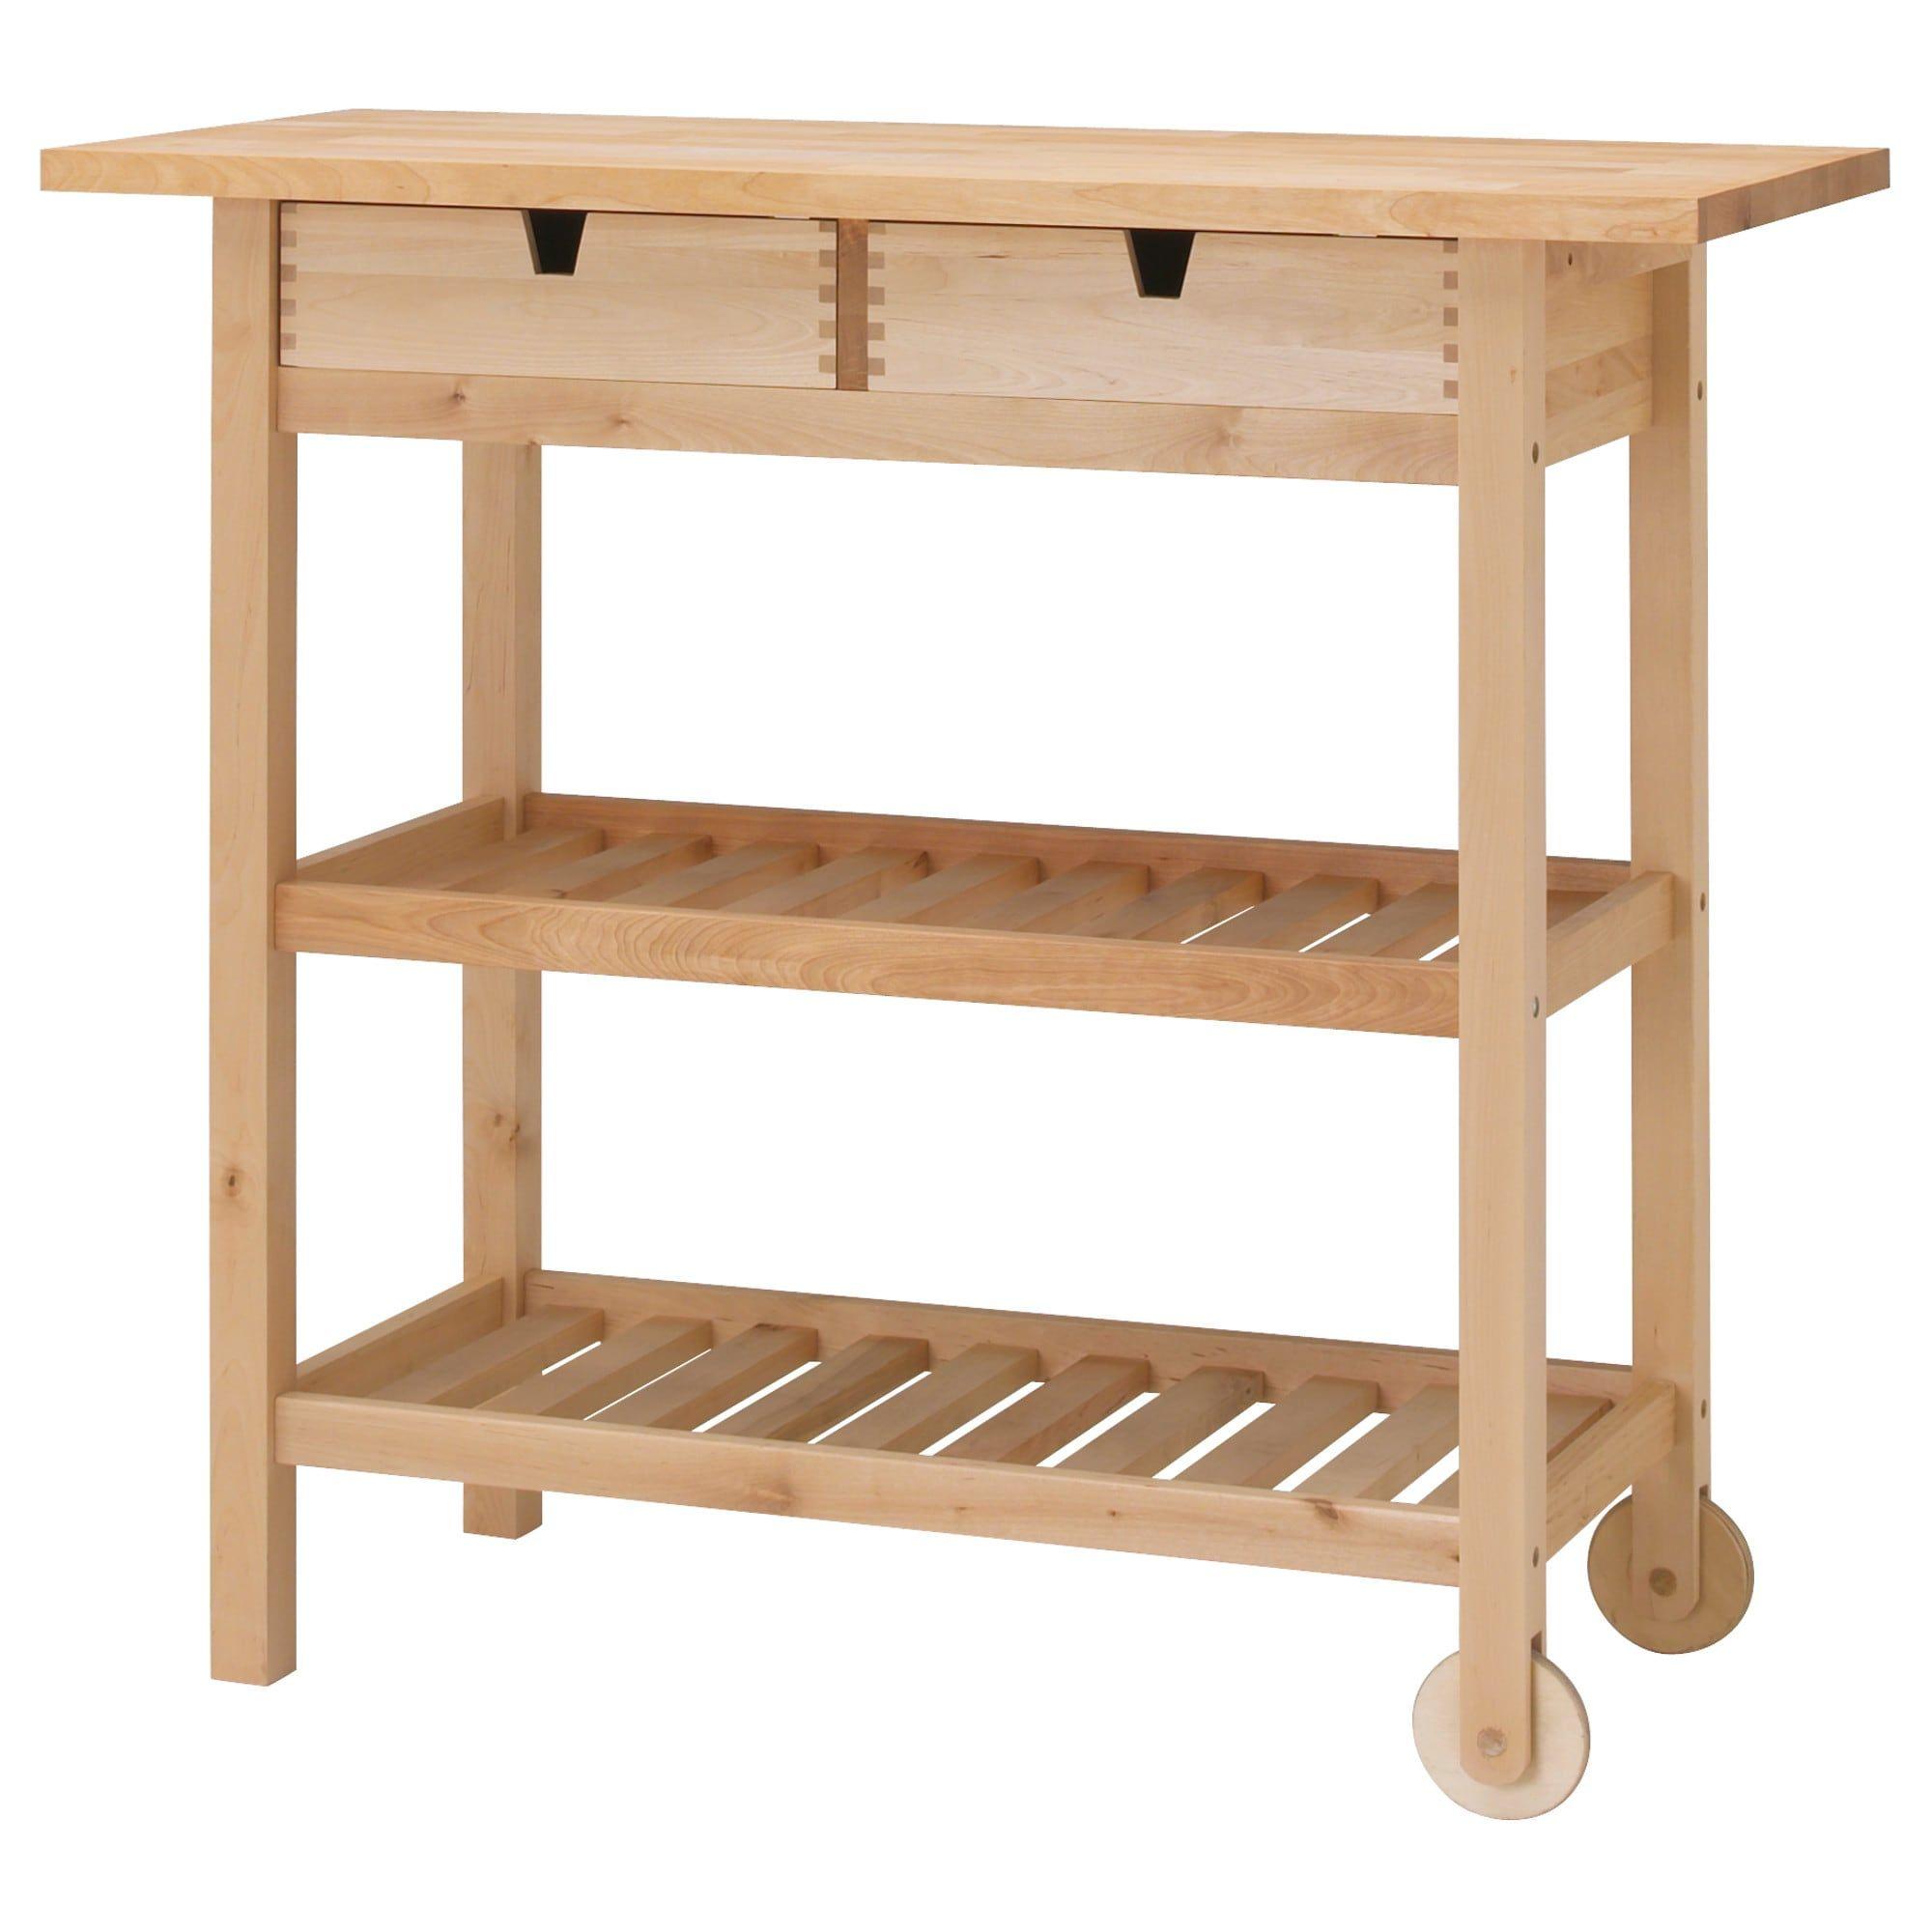 IKEA FORHOJA Birch Kitchen cart in 2019 | Ikea kitchen cart ...